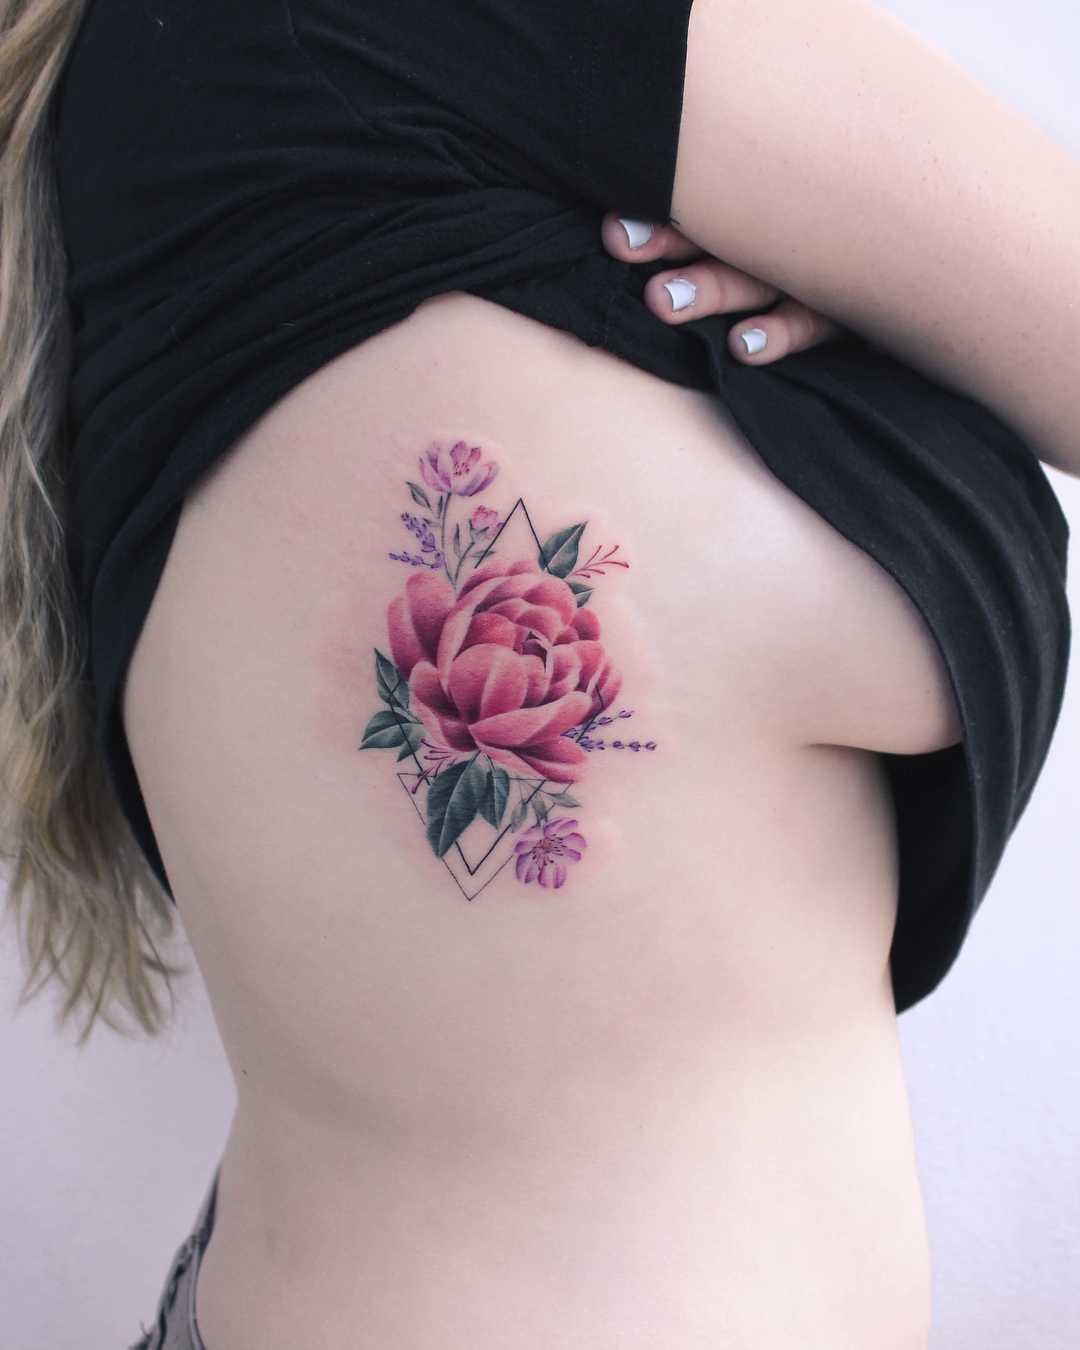 Peony tattoo on the rib cage by Iris Tattoo Art